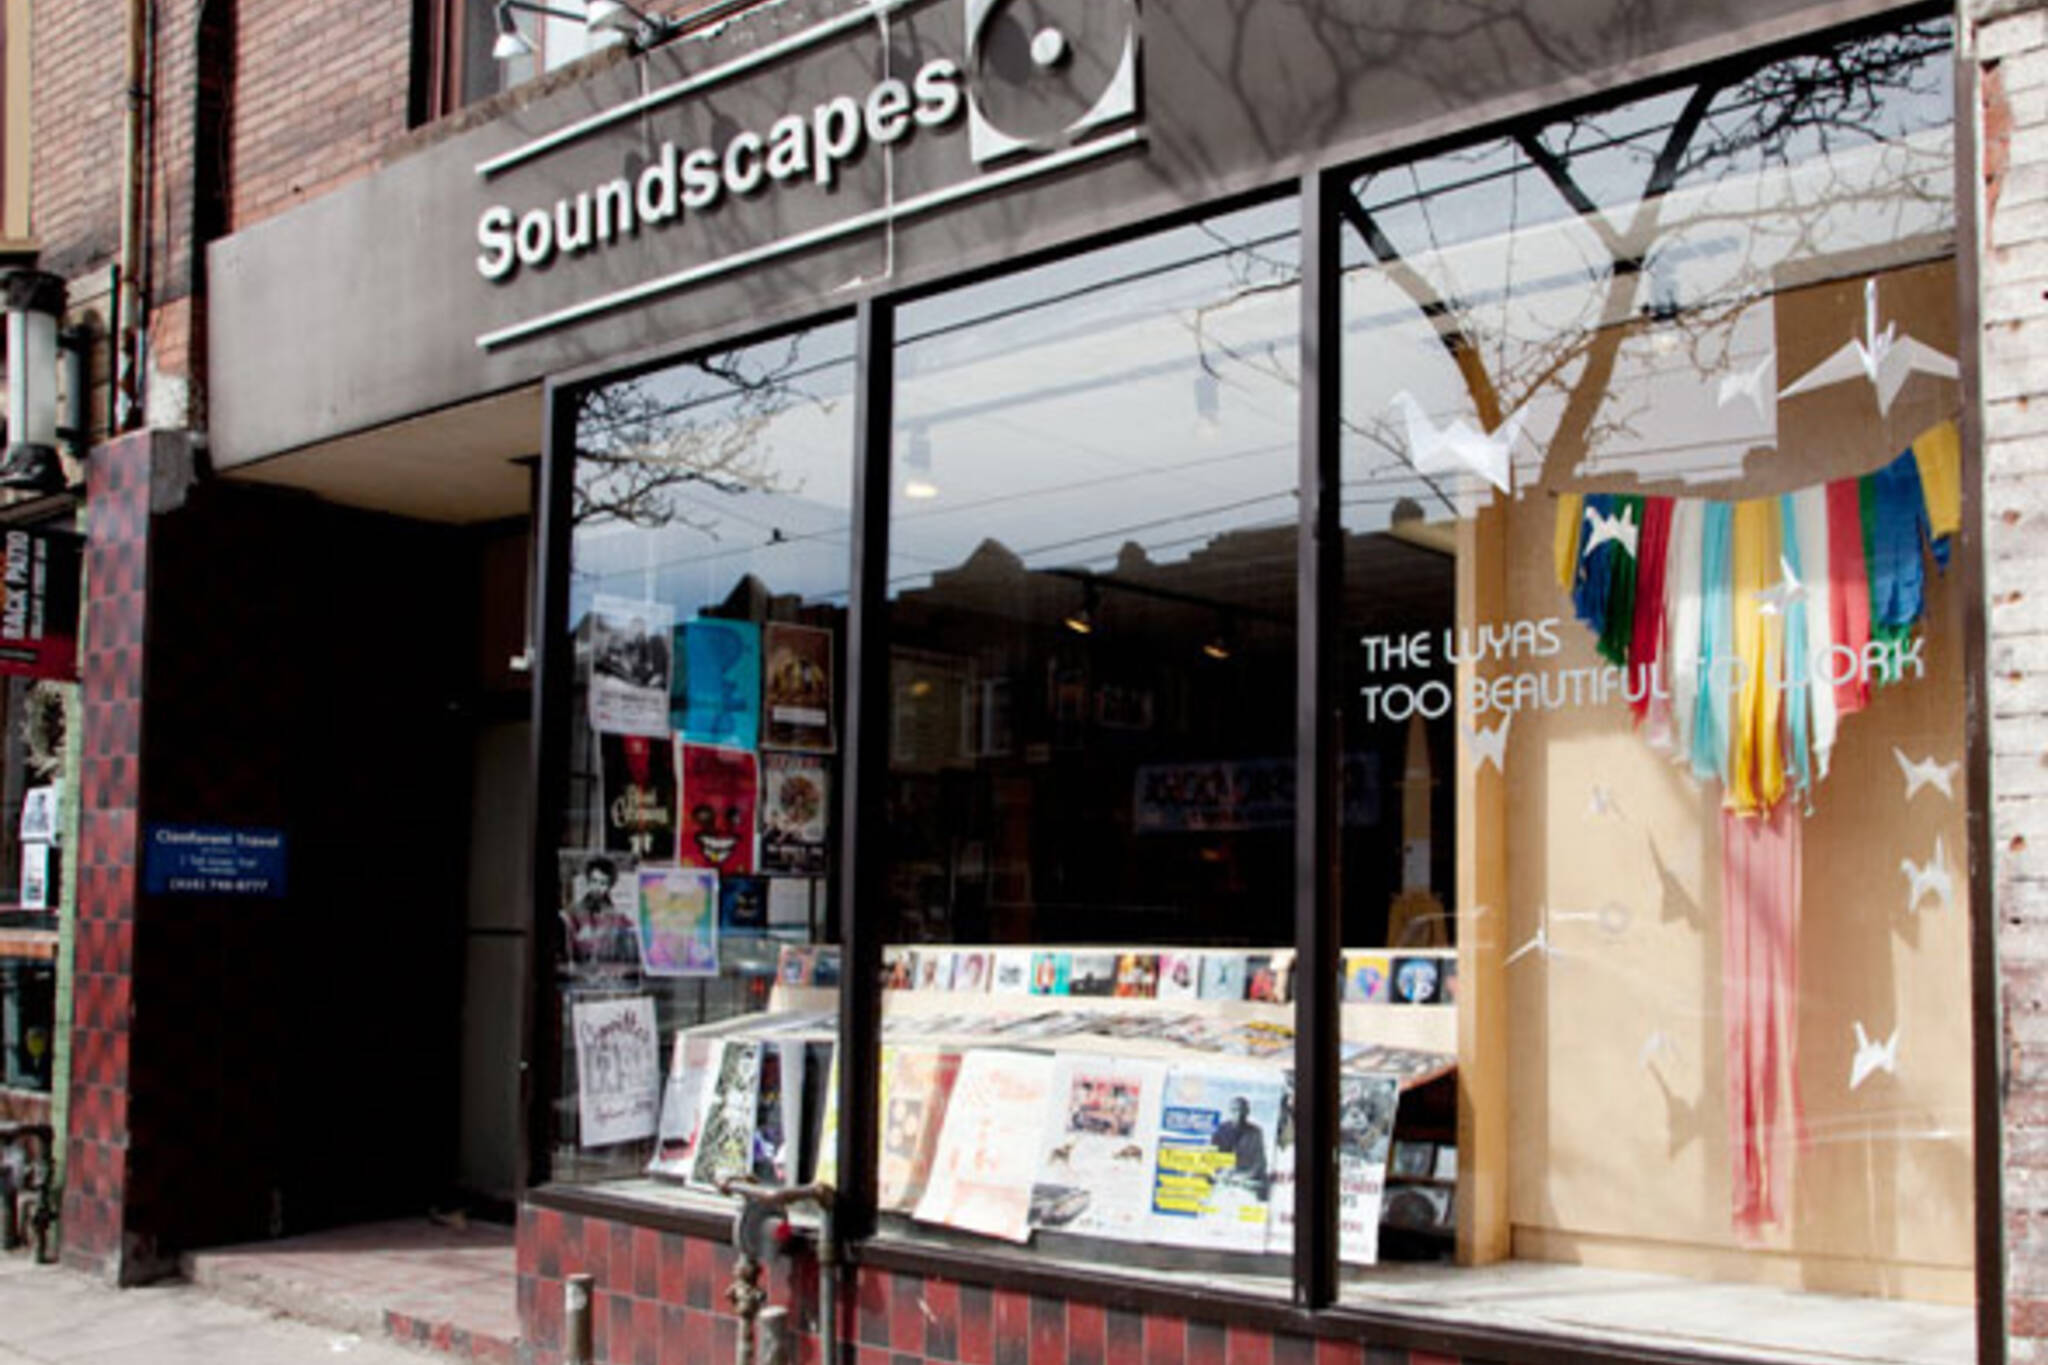 Soundscapes store Toronto